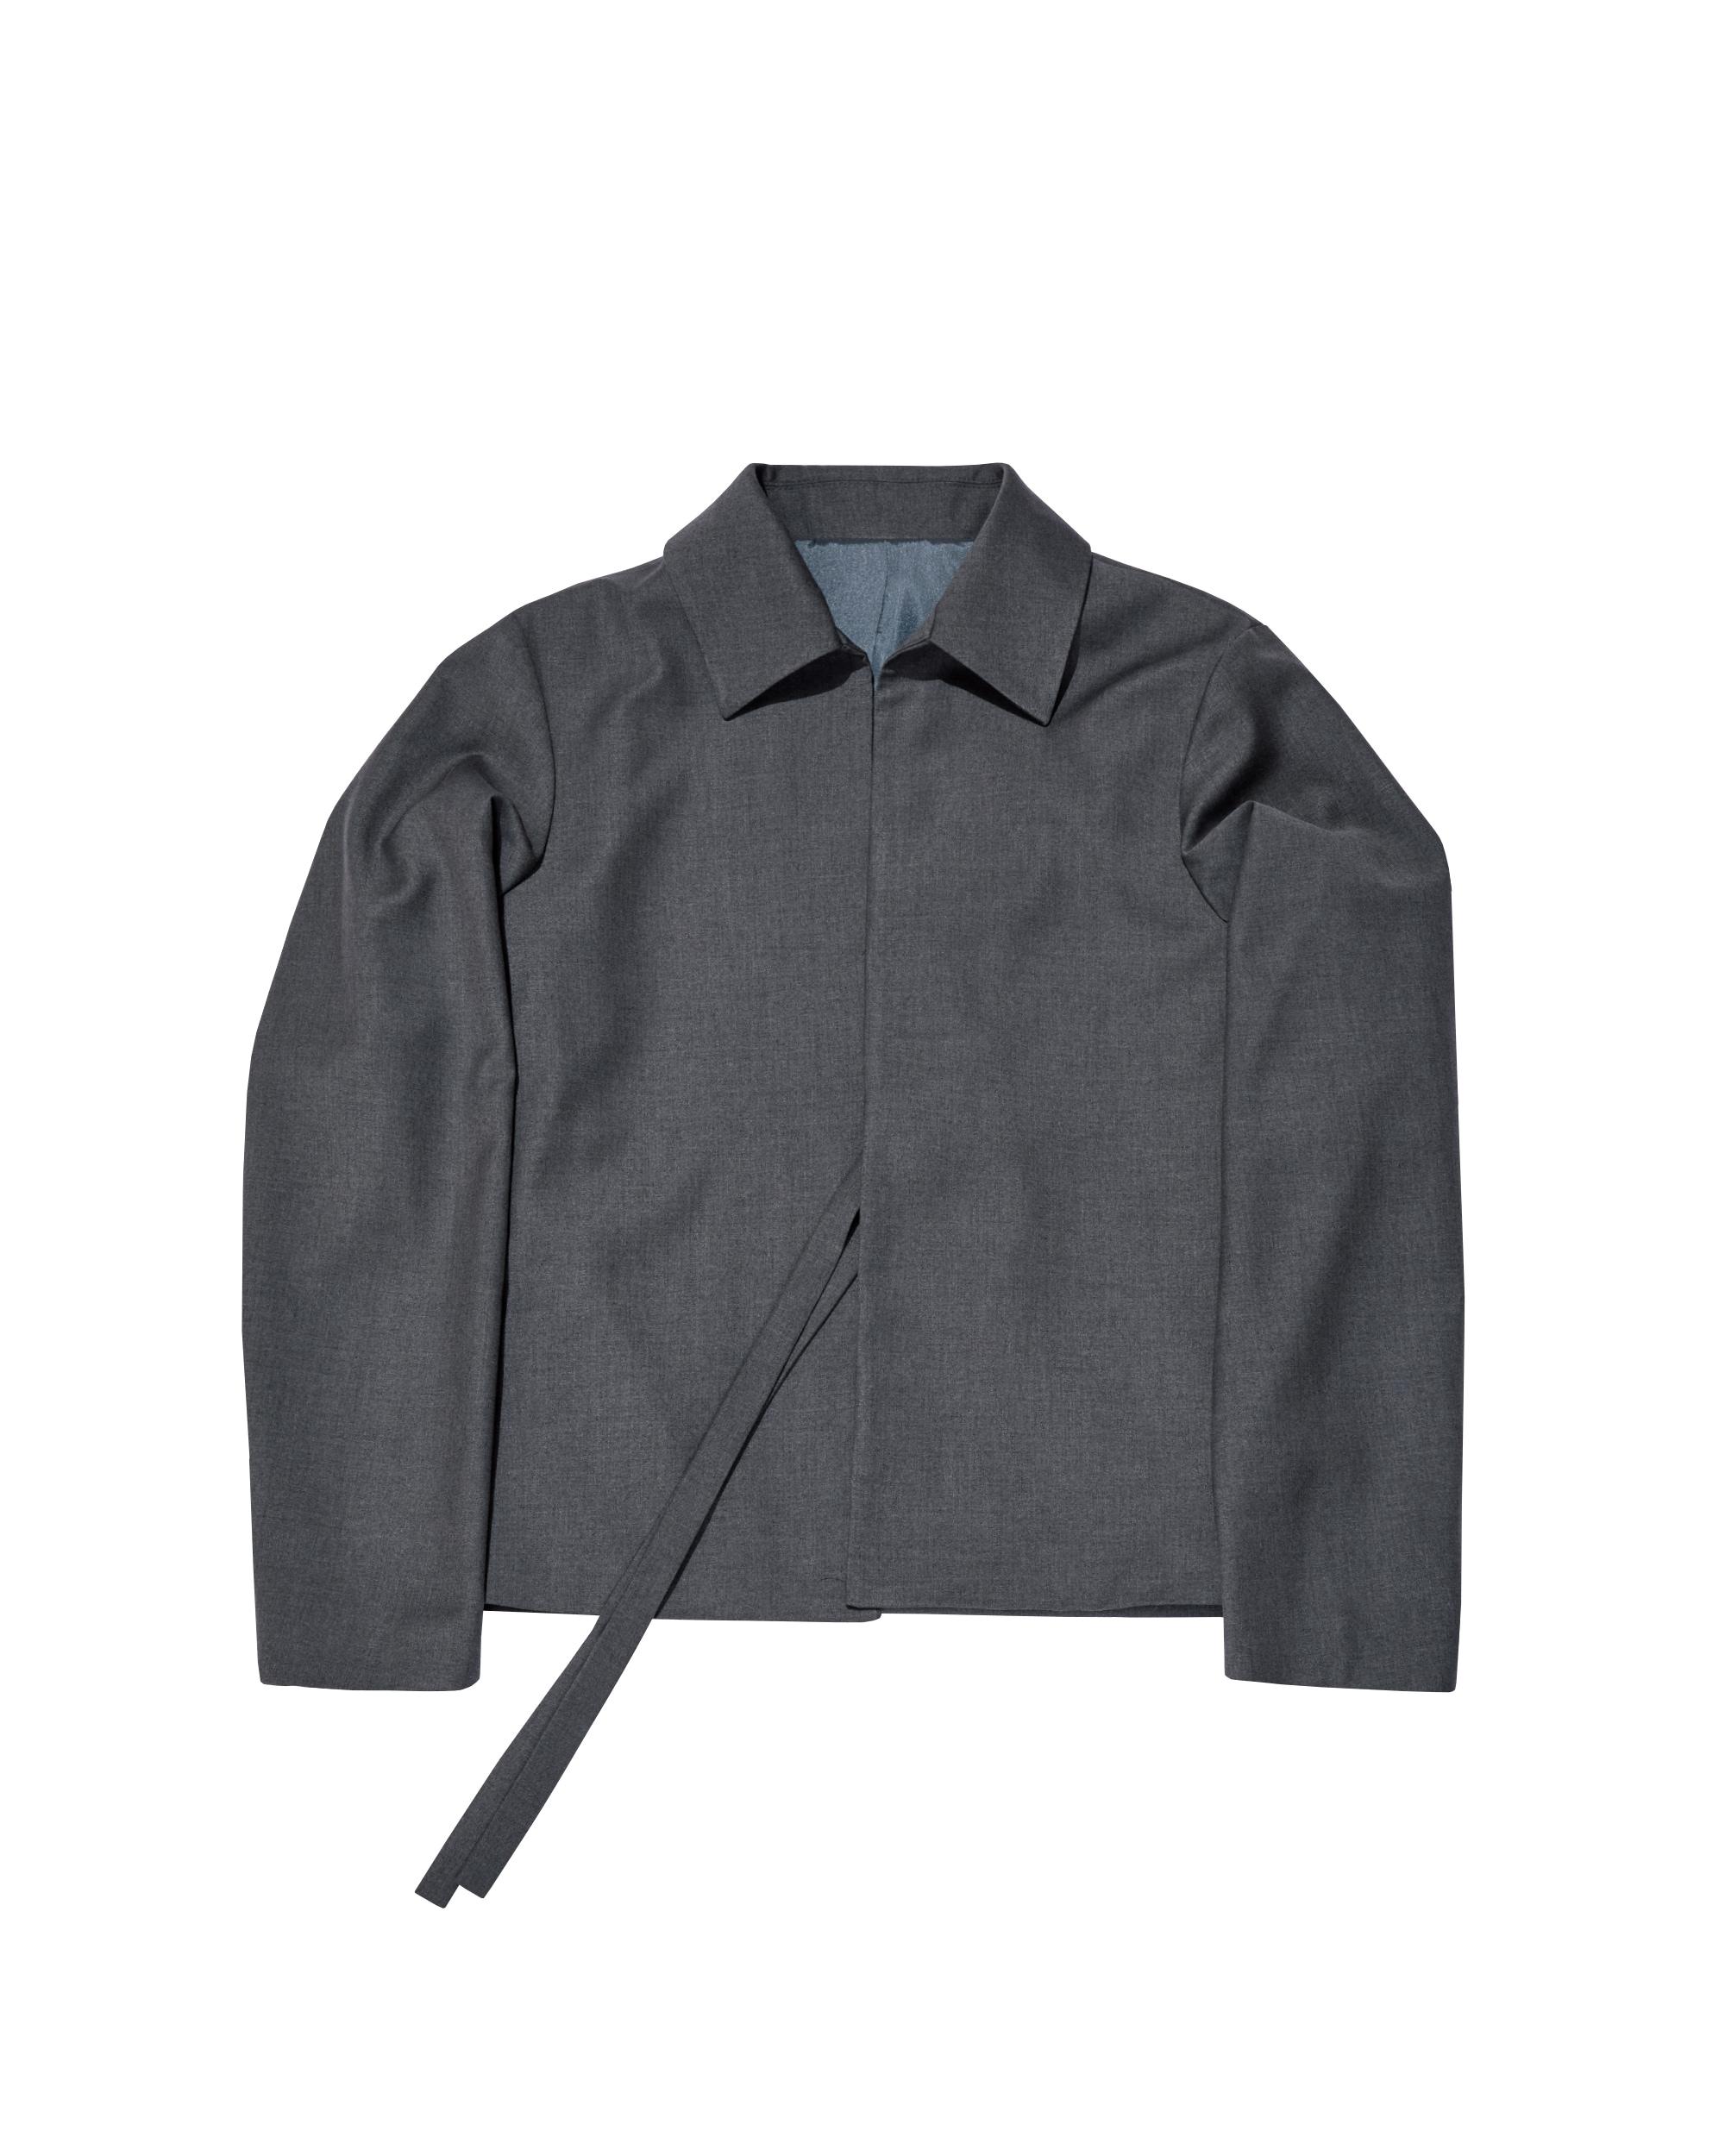 shop-blazer-gray-onedna.jpg